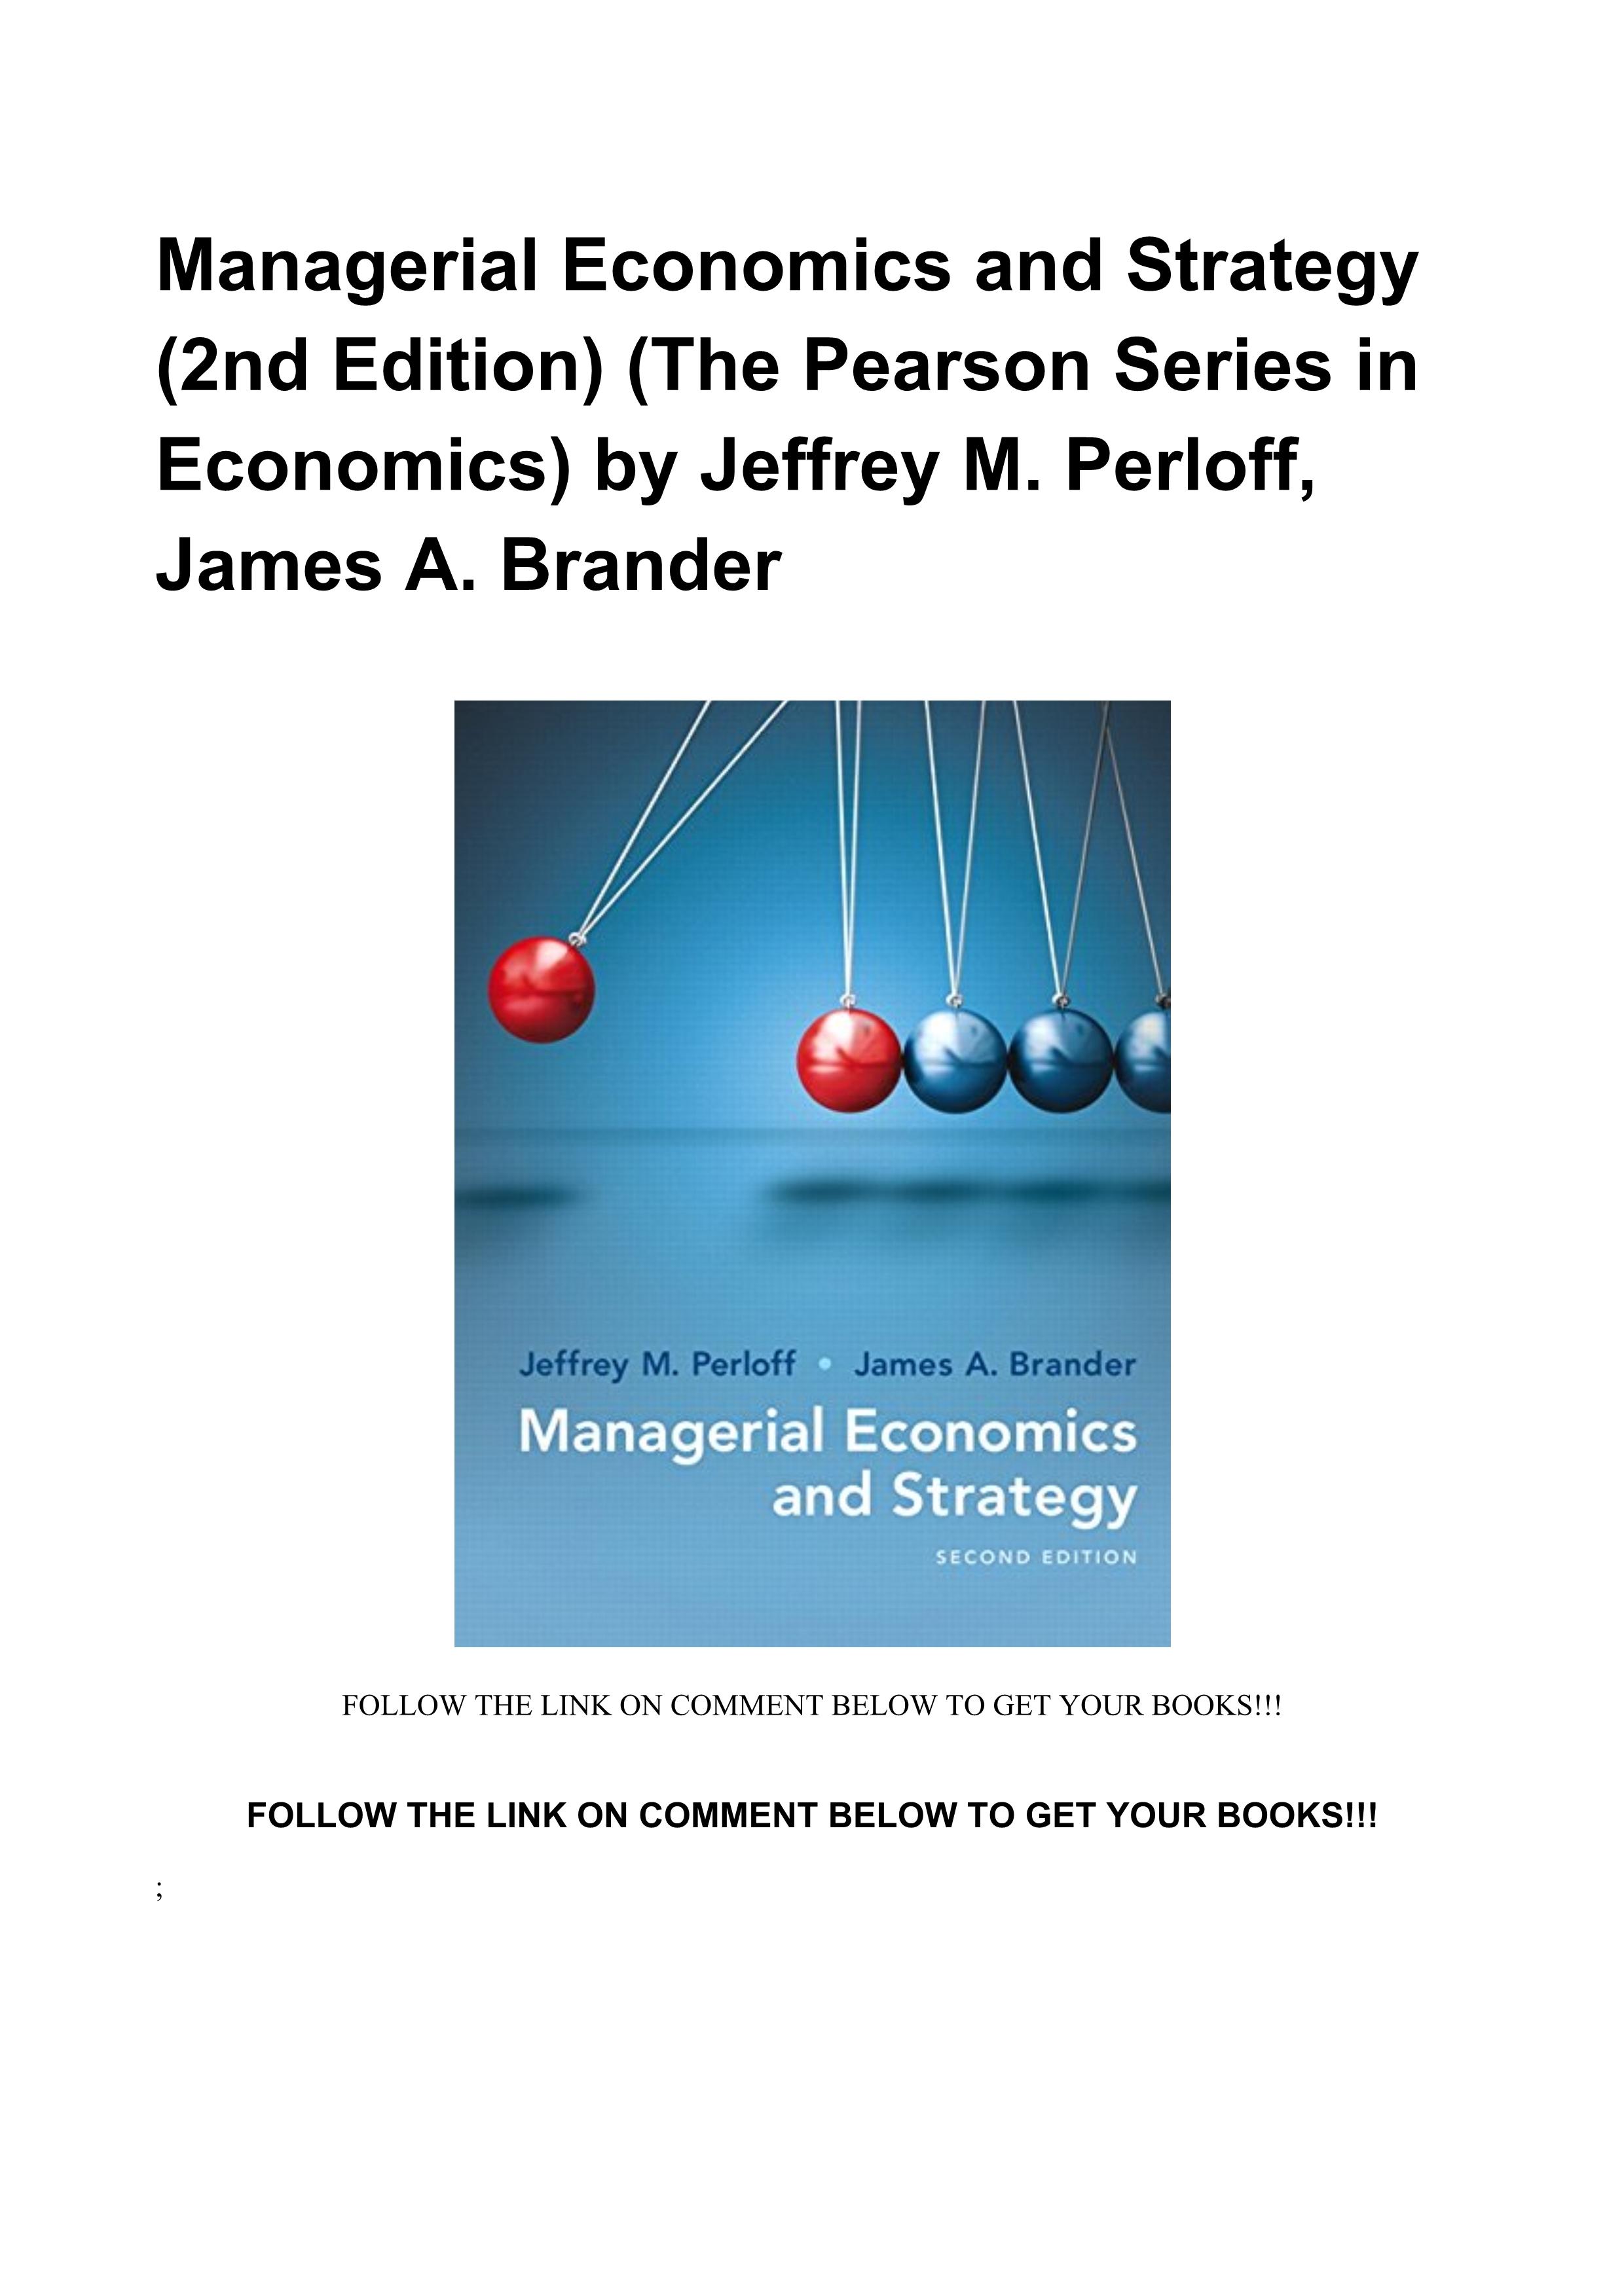 Managerial Economics Pearson Pdf